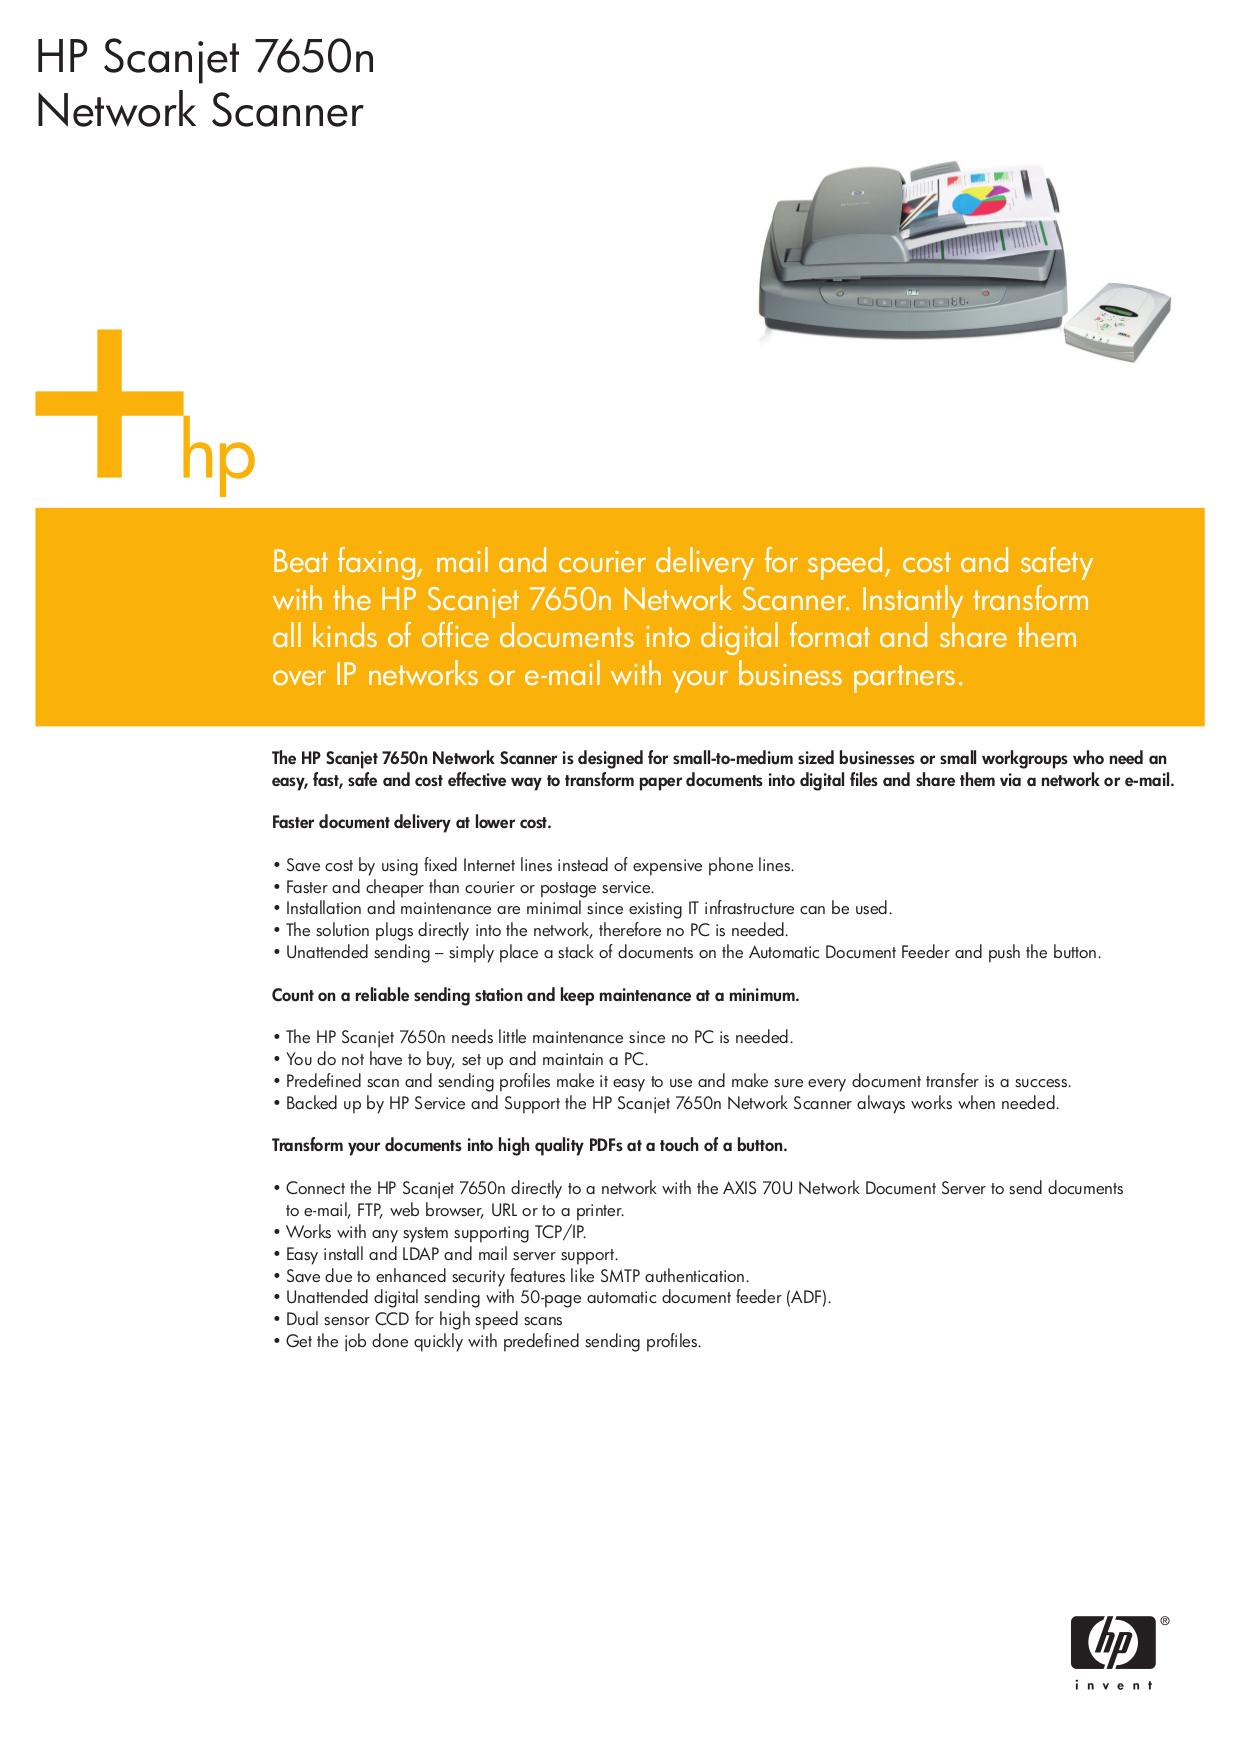 Hp scanjet 7650 document flatbed scanner | hp® customer support.